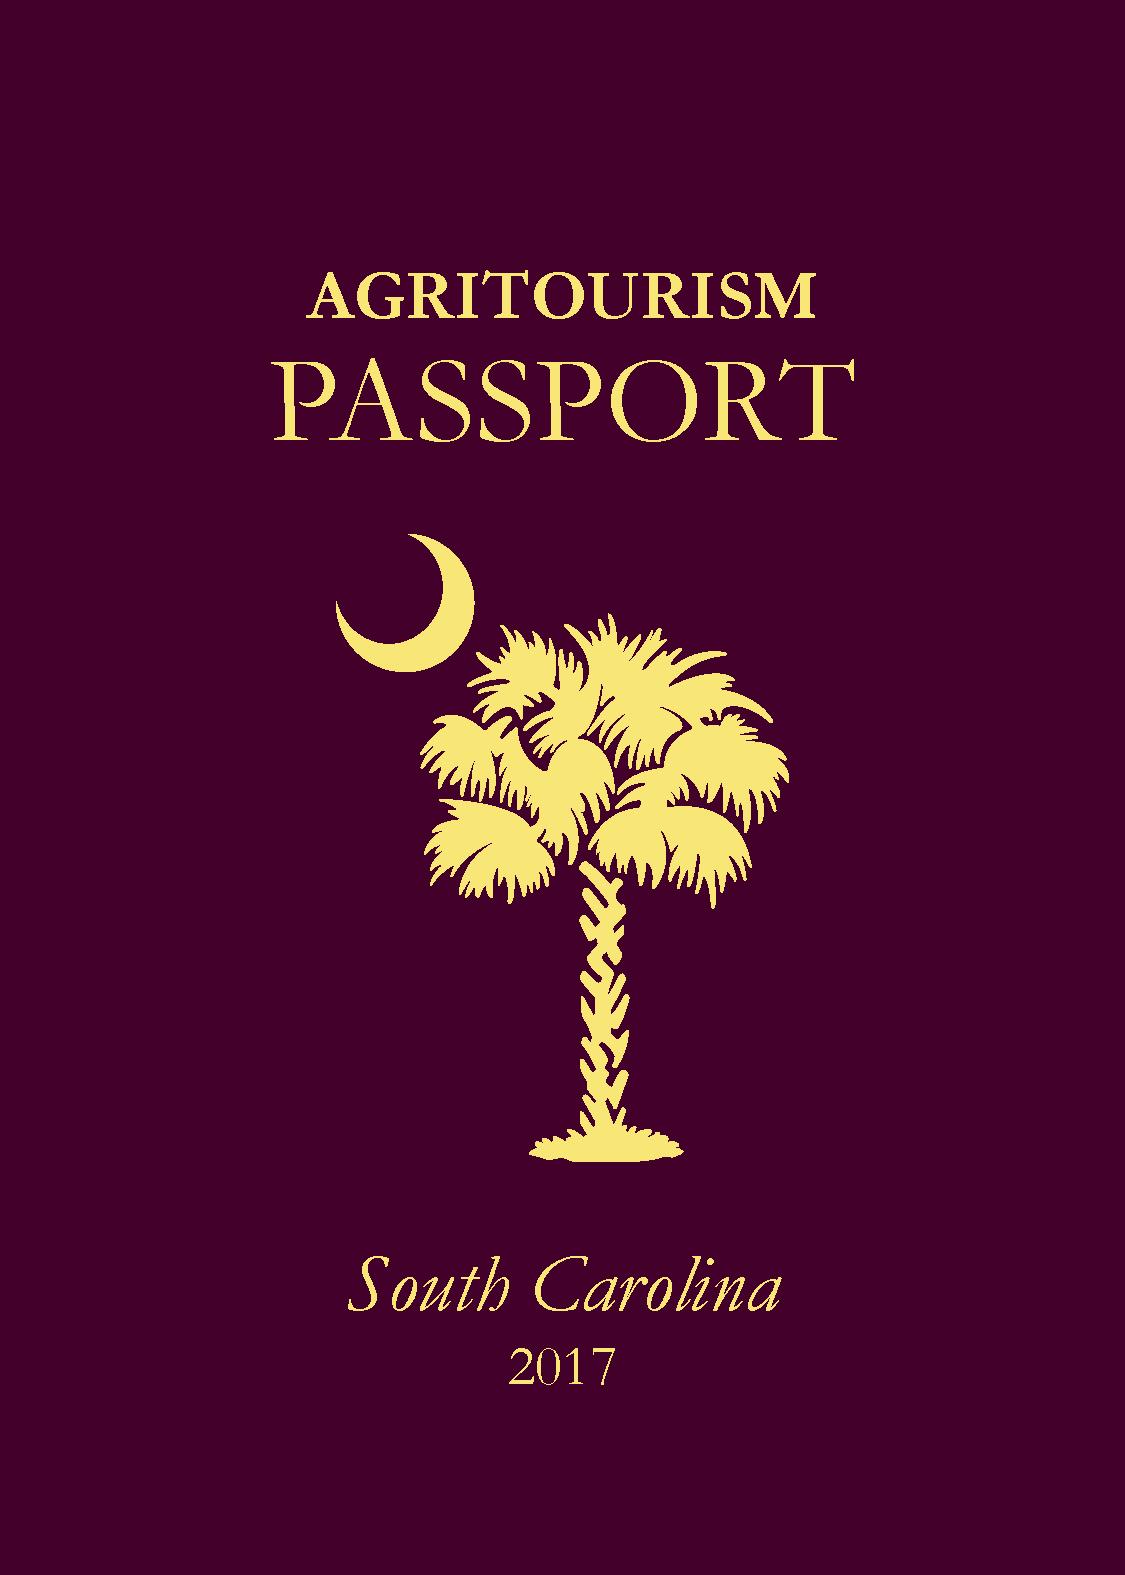 AgritourismPassportCover2017